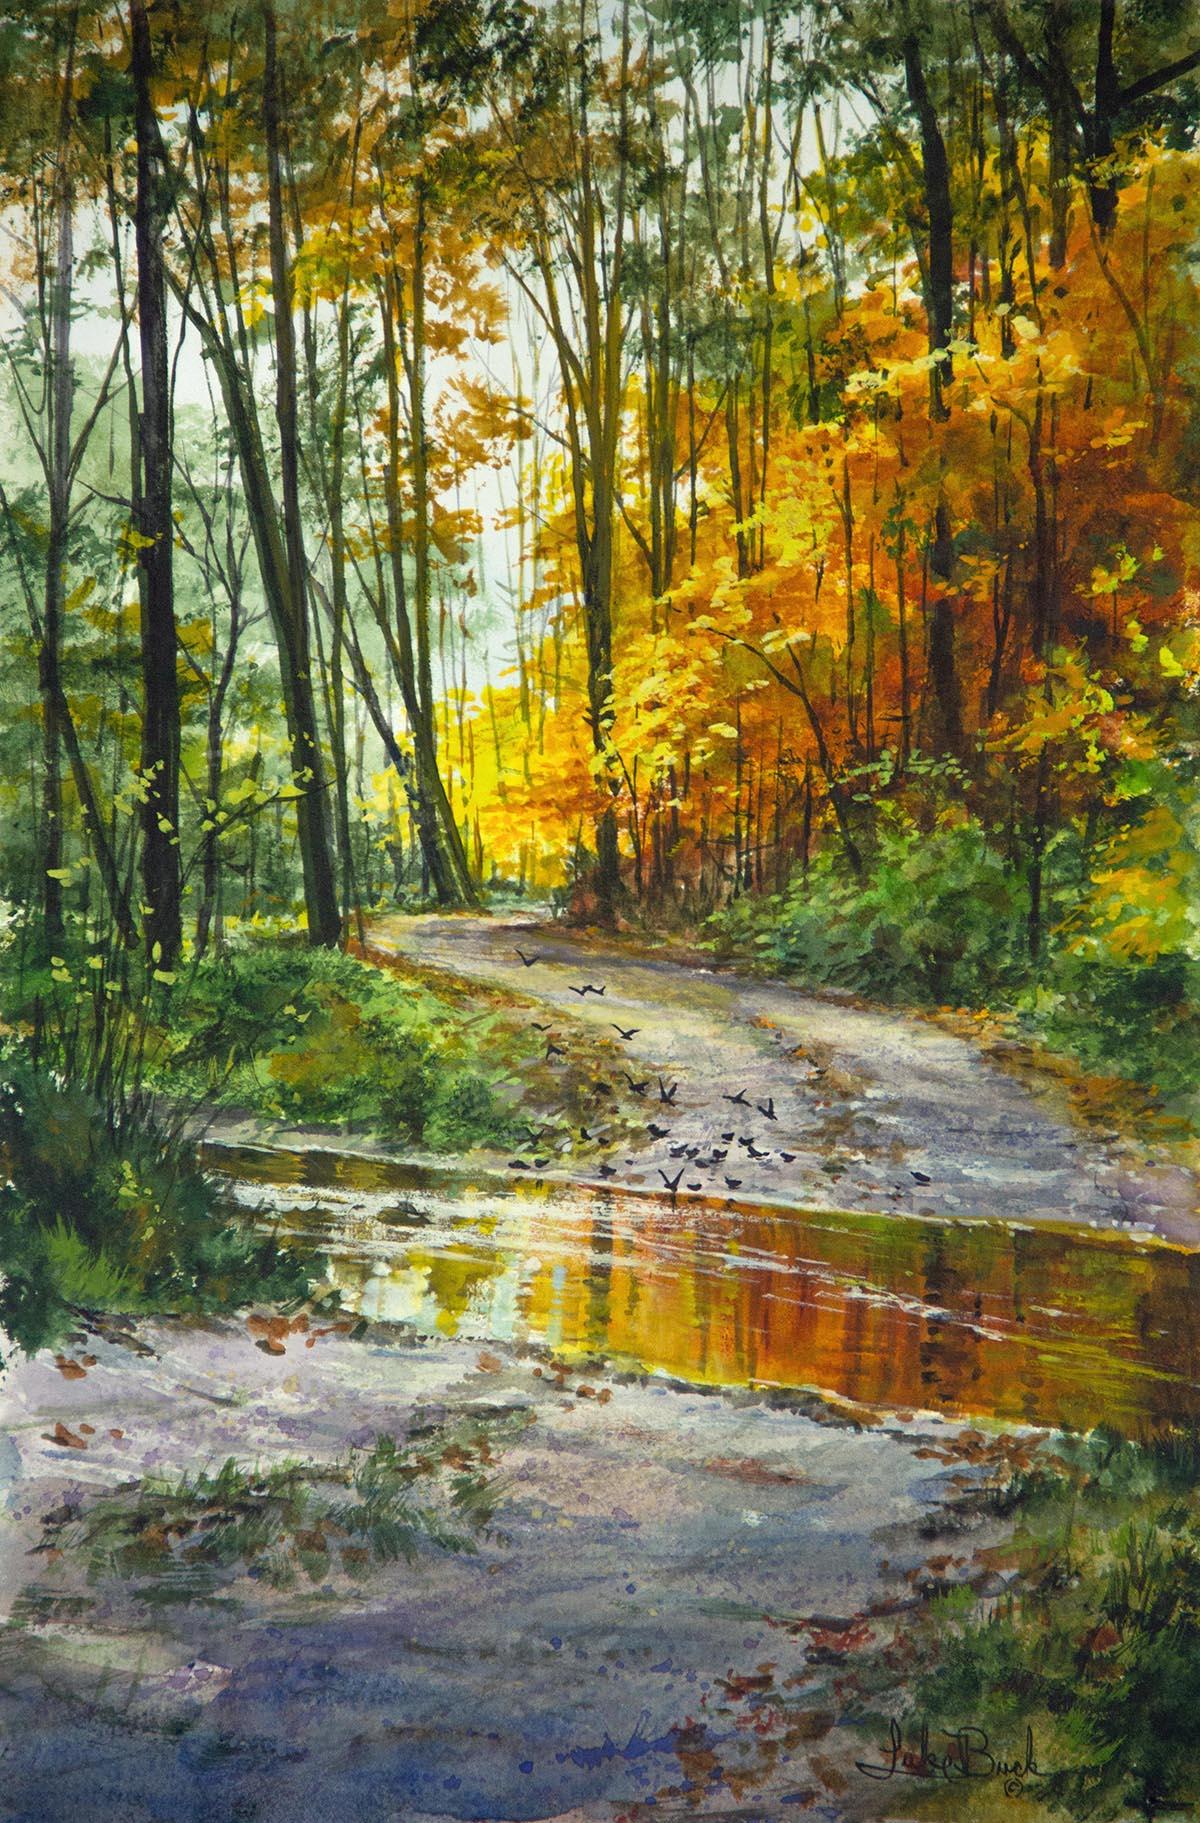 Yellowwood Trail Ford - Luke Buck